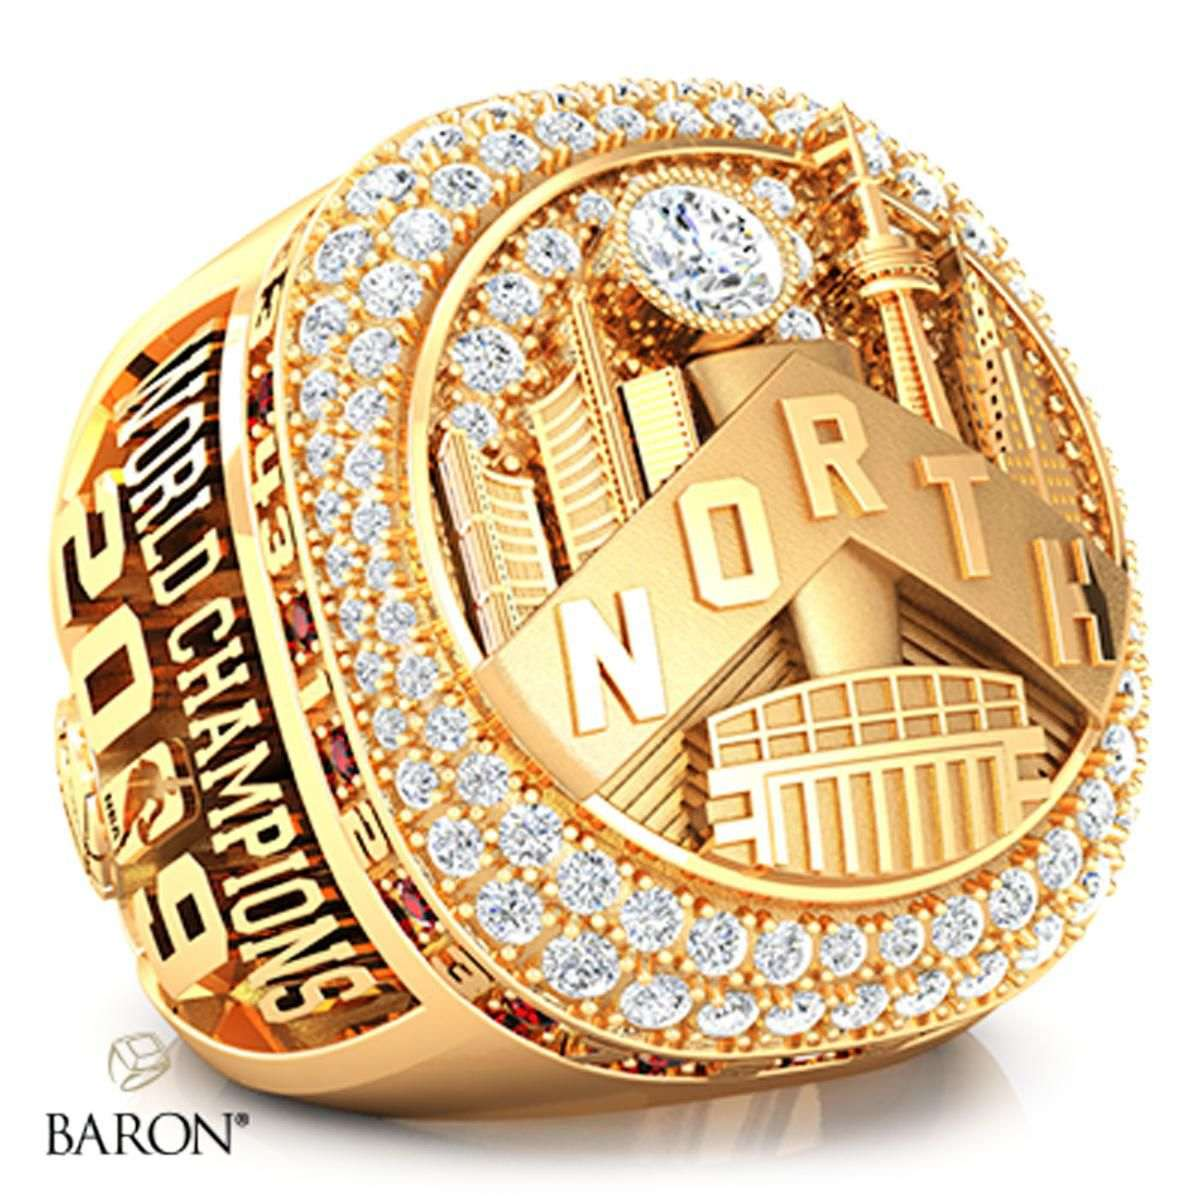 NBA finals ring, raptors, championship ring